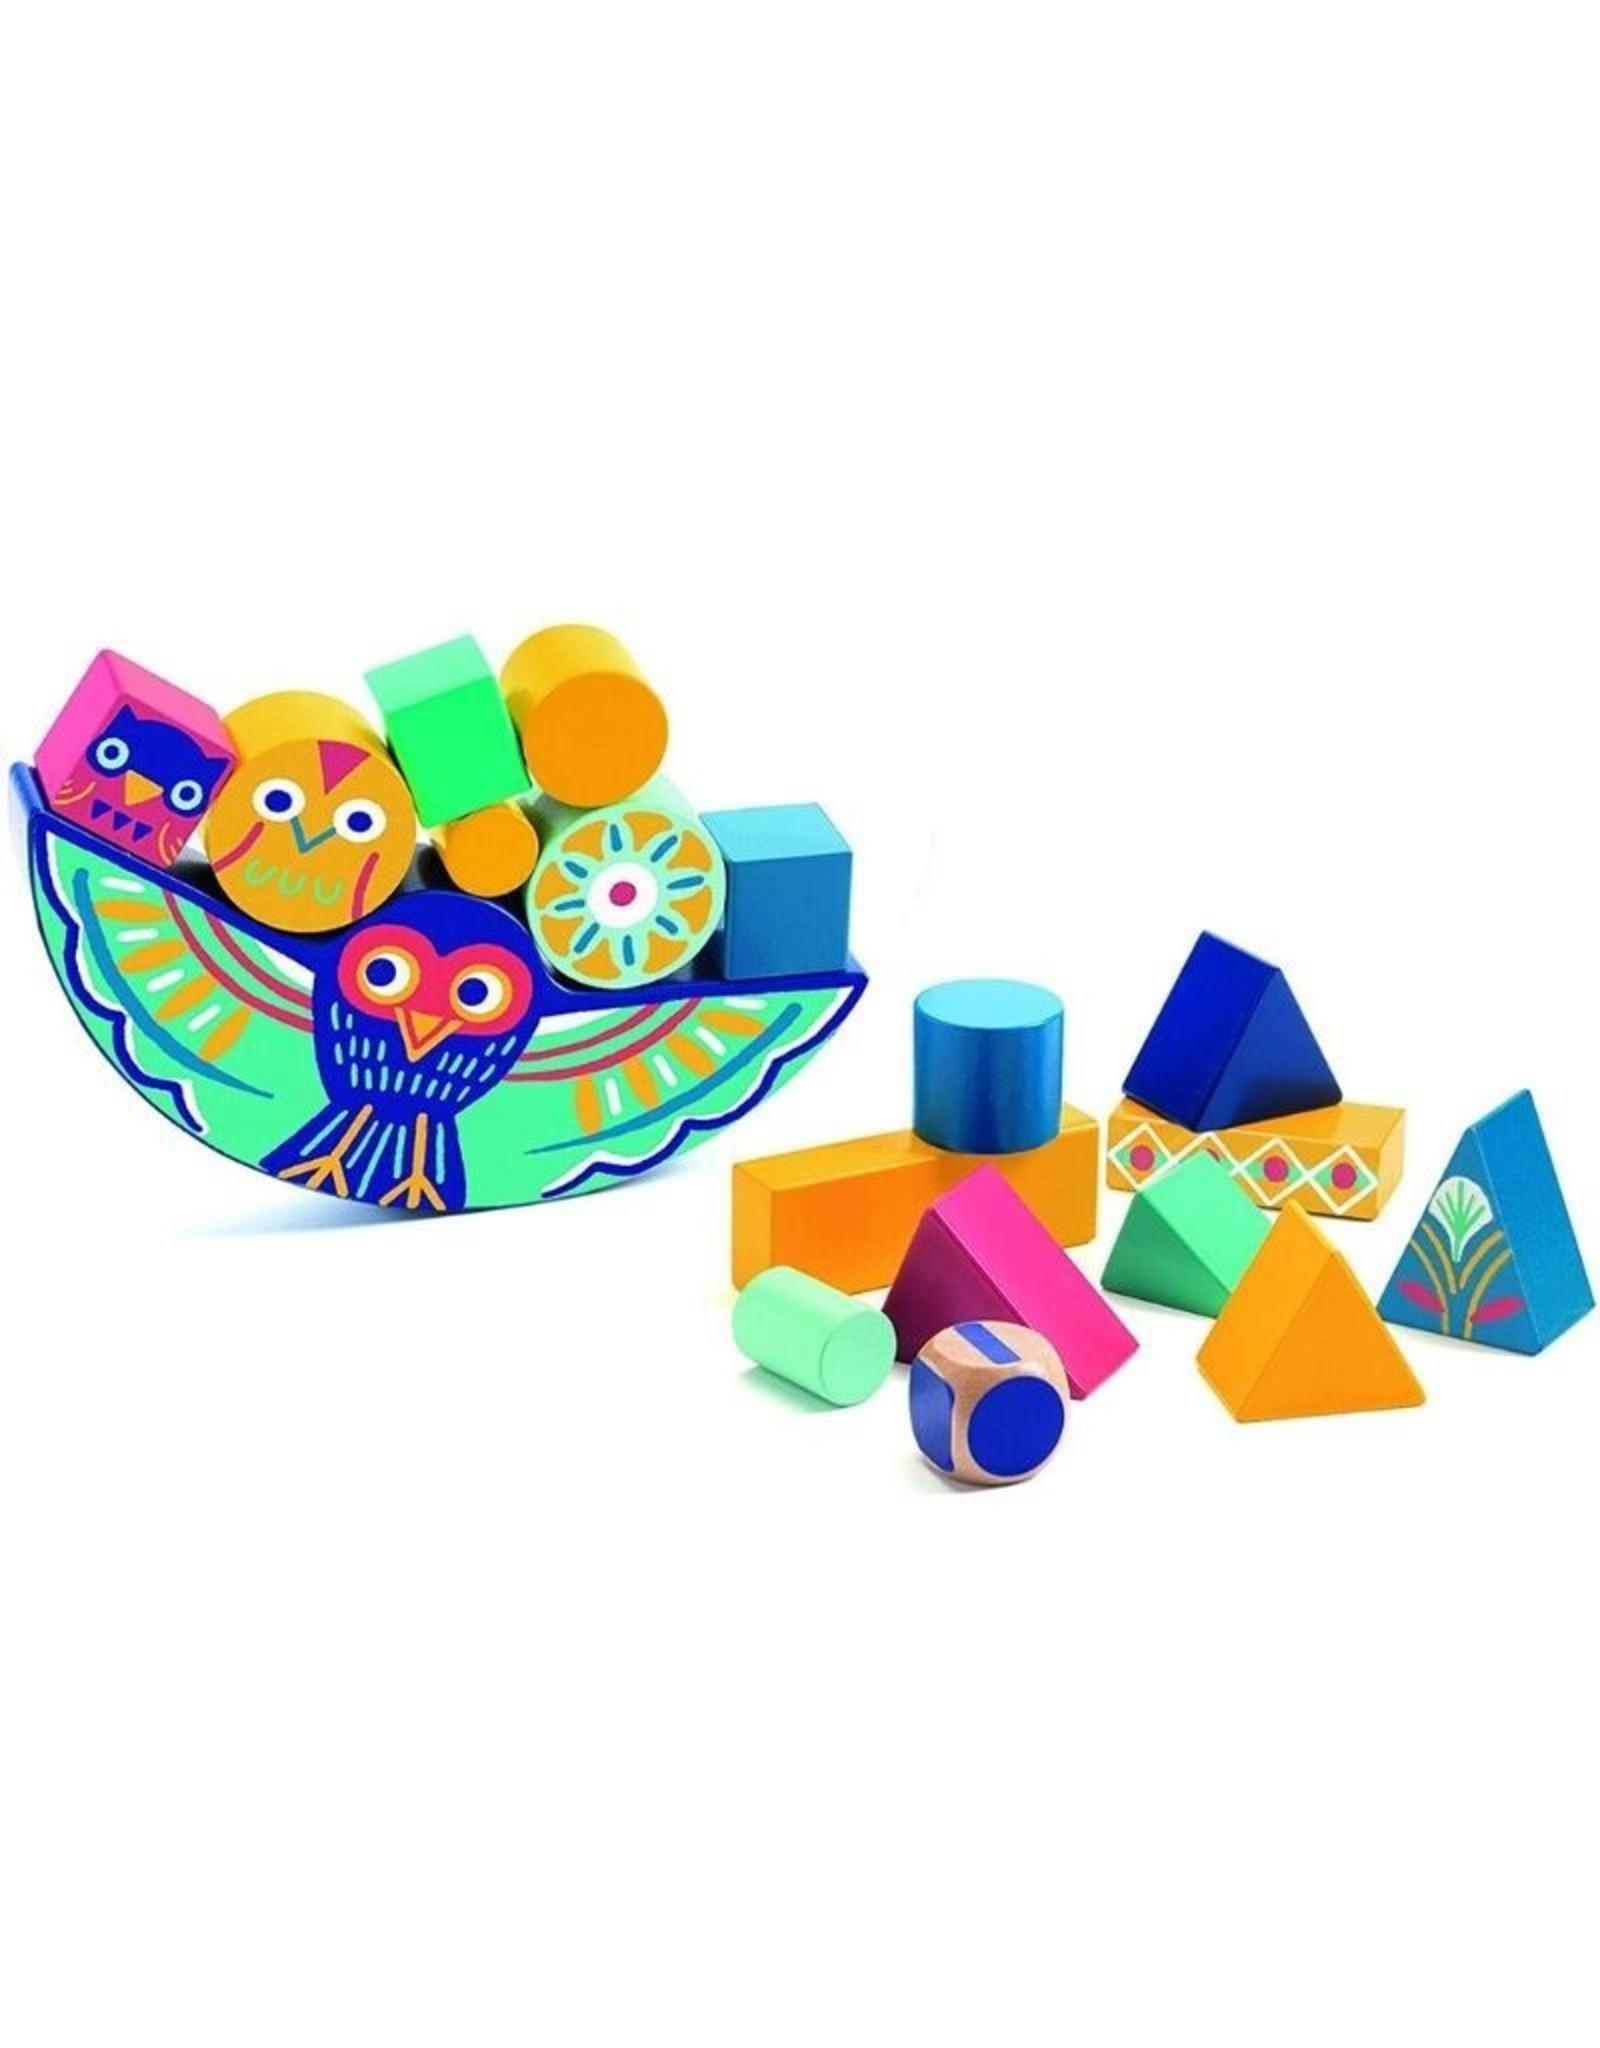 Djeco Ze Balanceo Blocks